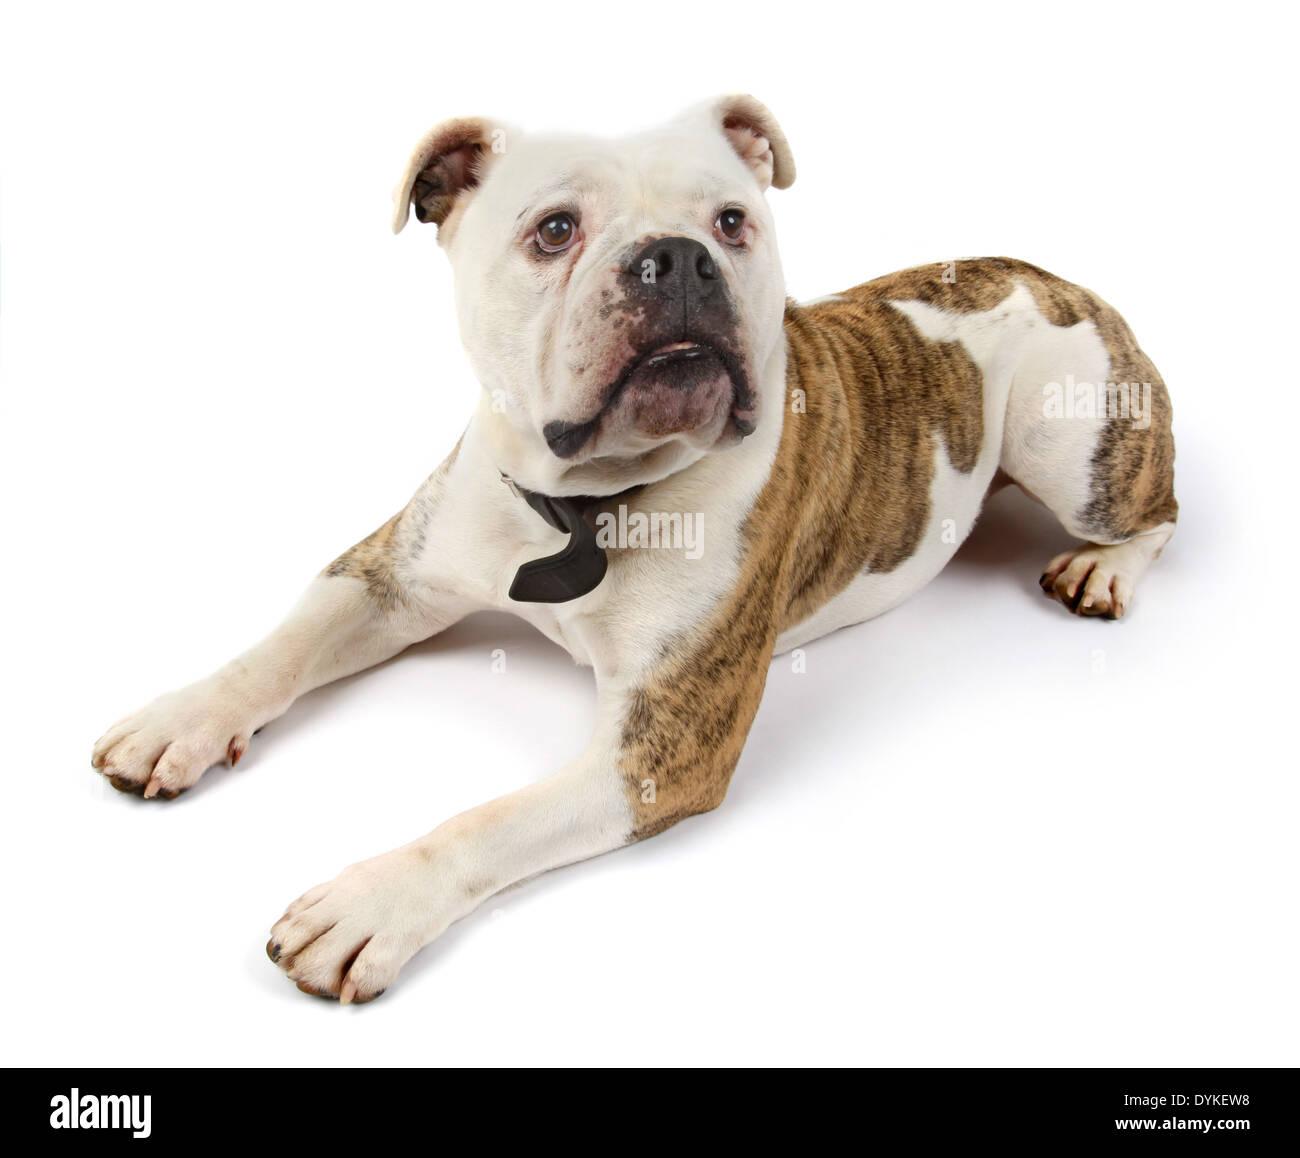 dog english bulldog pet englische Bulldogge - Stock Image